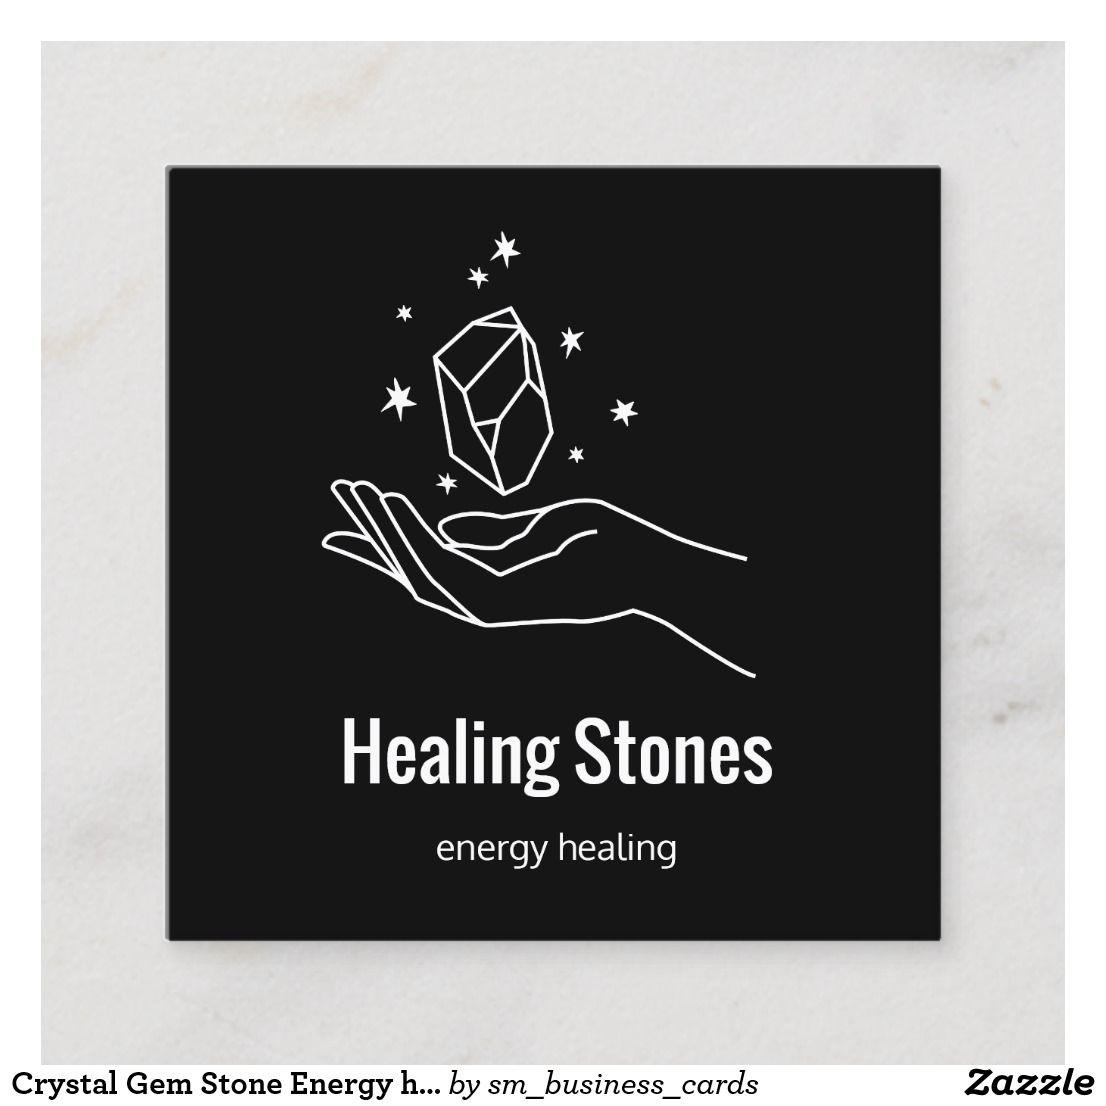 Crystal gem stone energy healer square business card